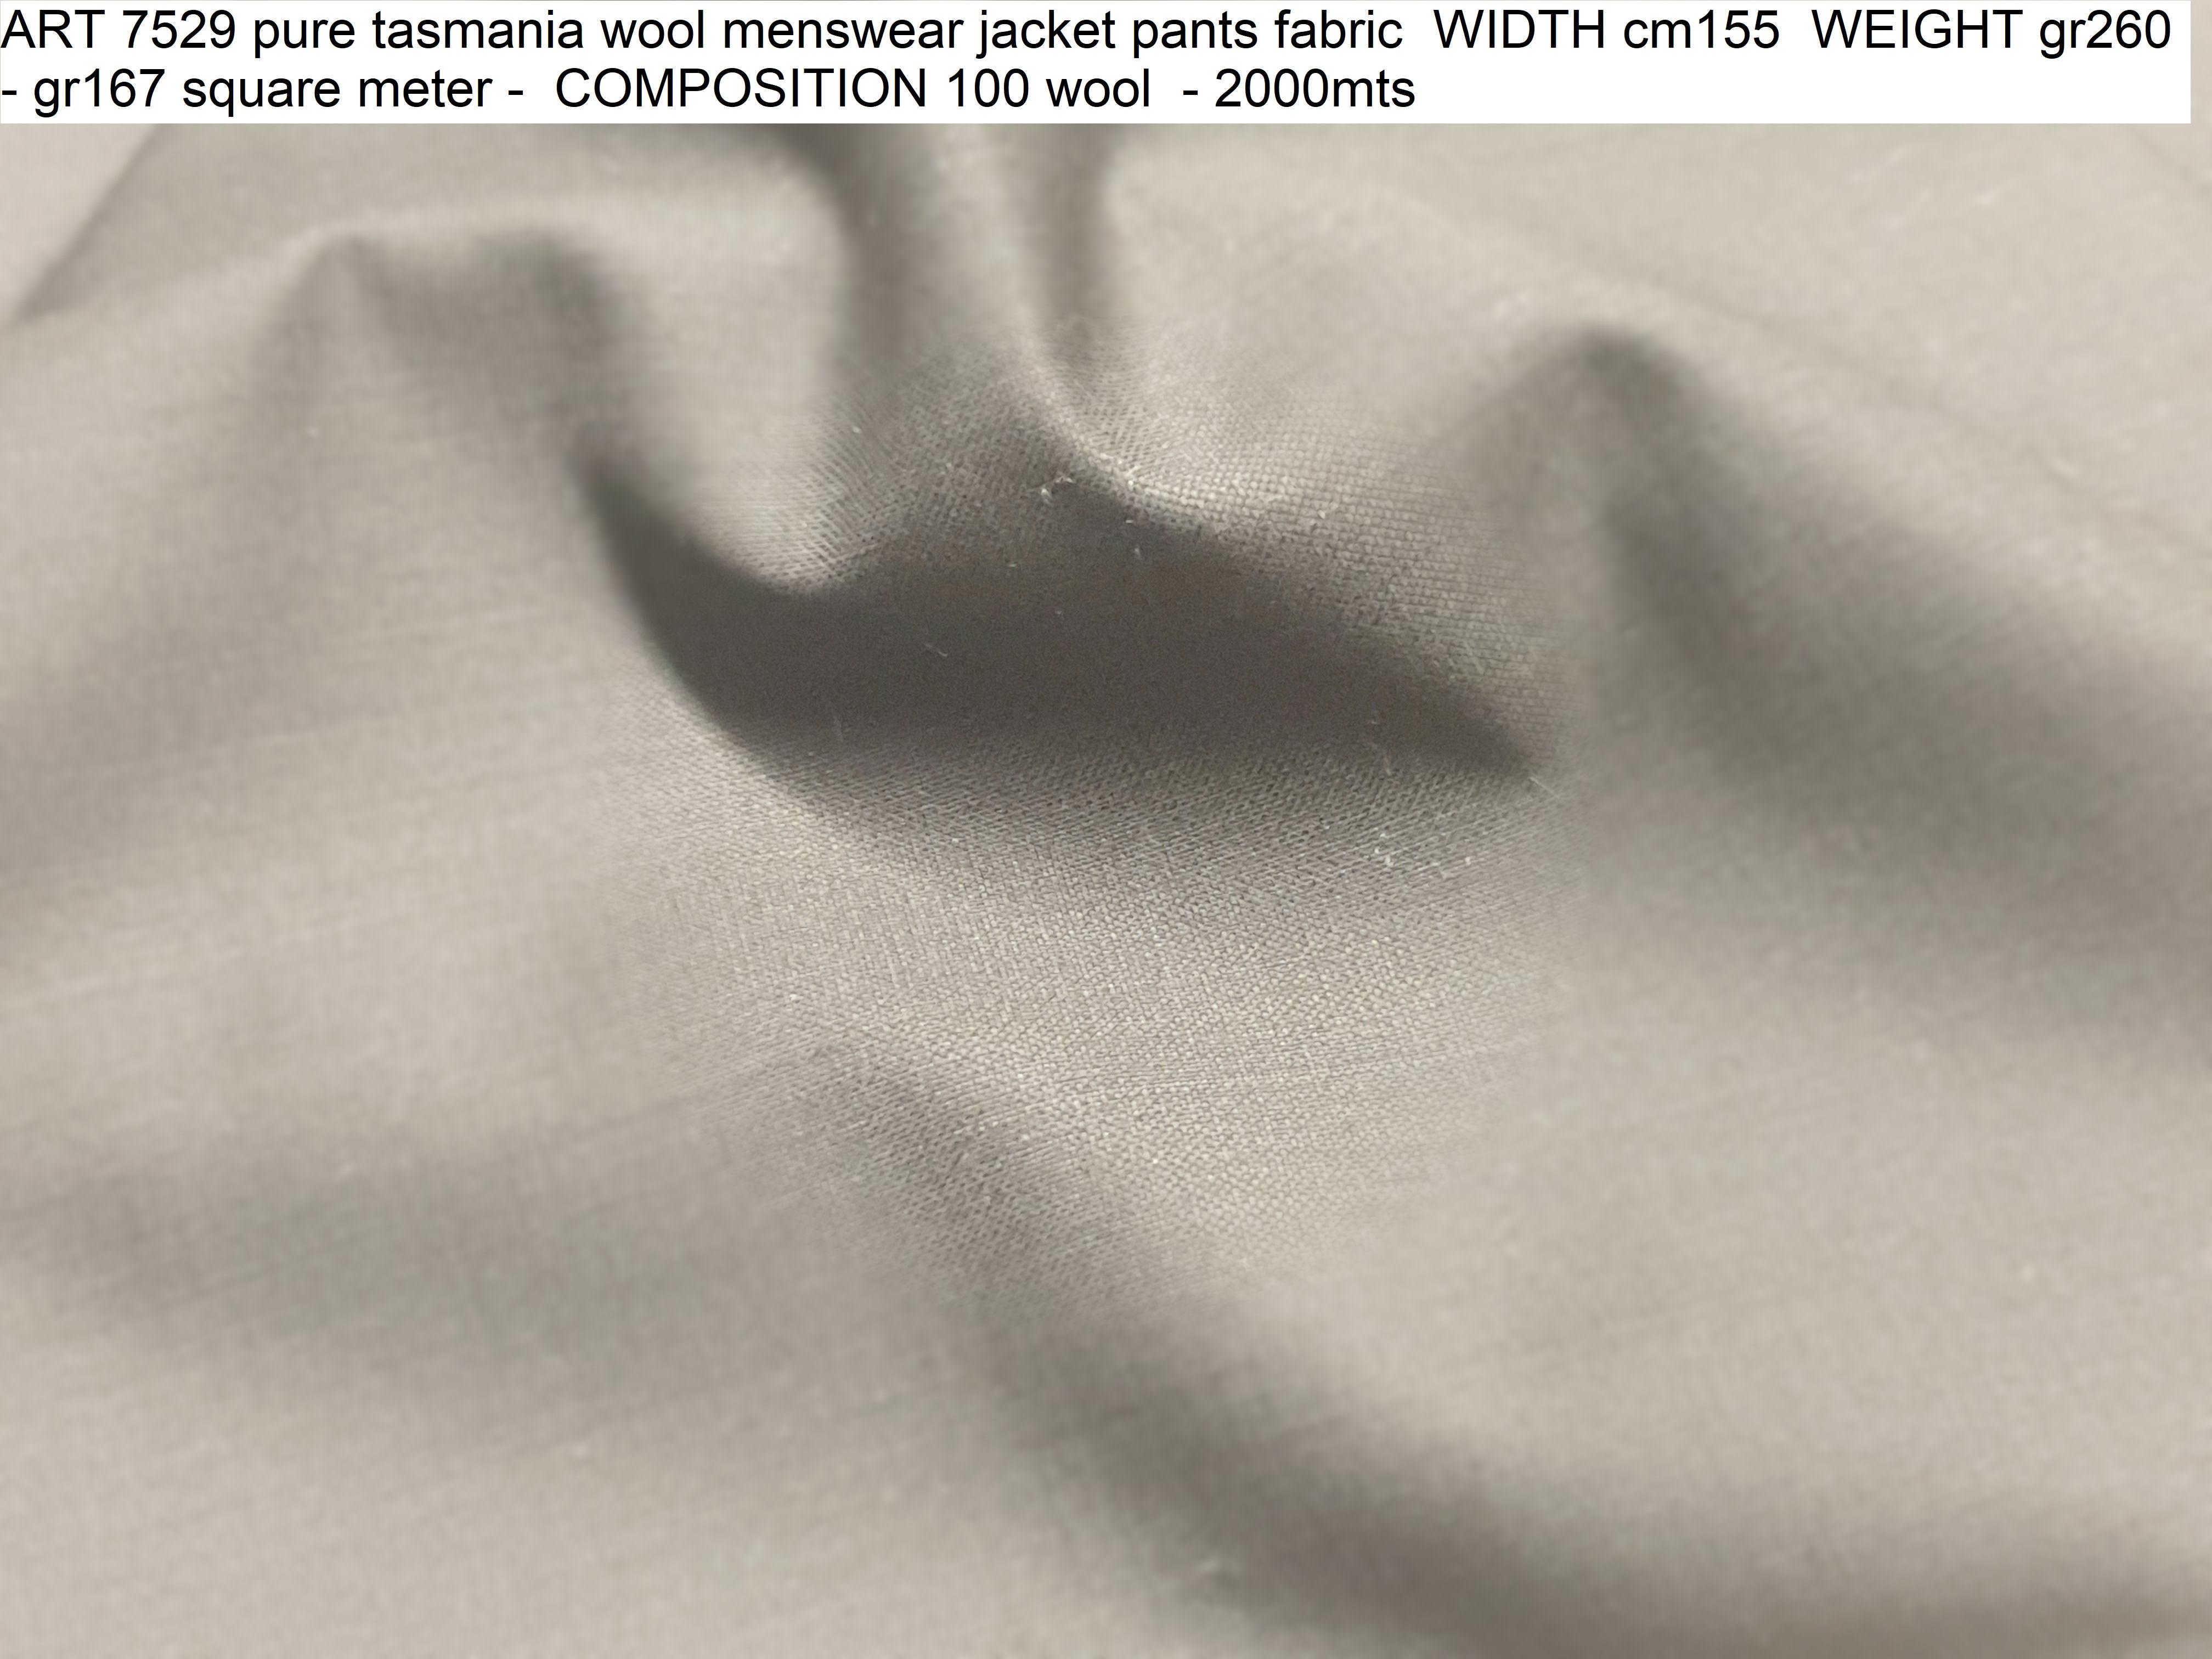 ART 7529 pure tasmania wool menswear jacket pants fabric WIDTH cm155 WEIGHT gr260 - gr167 square meter - COMPOSITION 100 wool - 2000mts